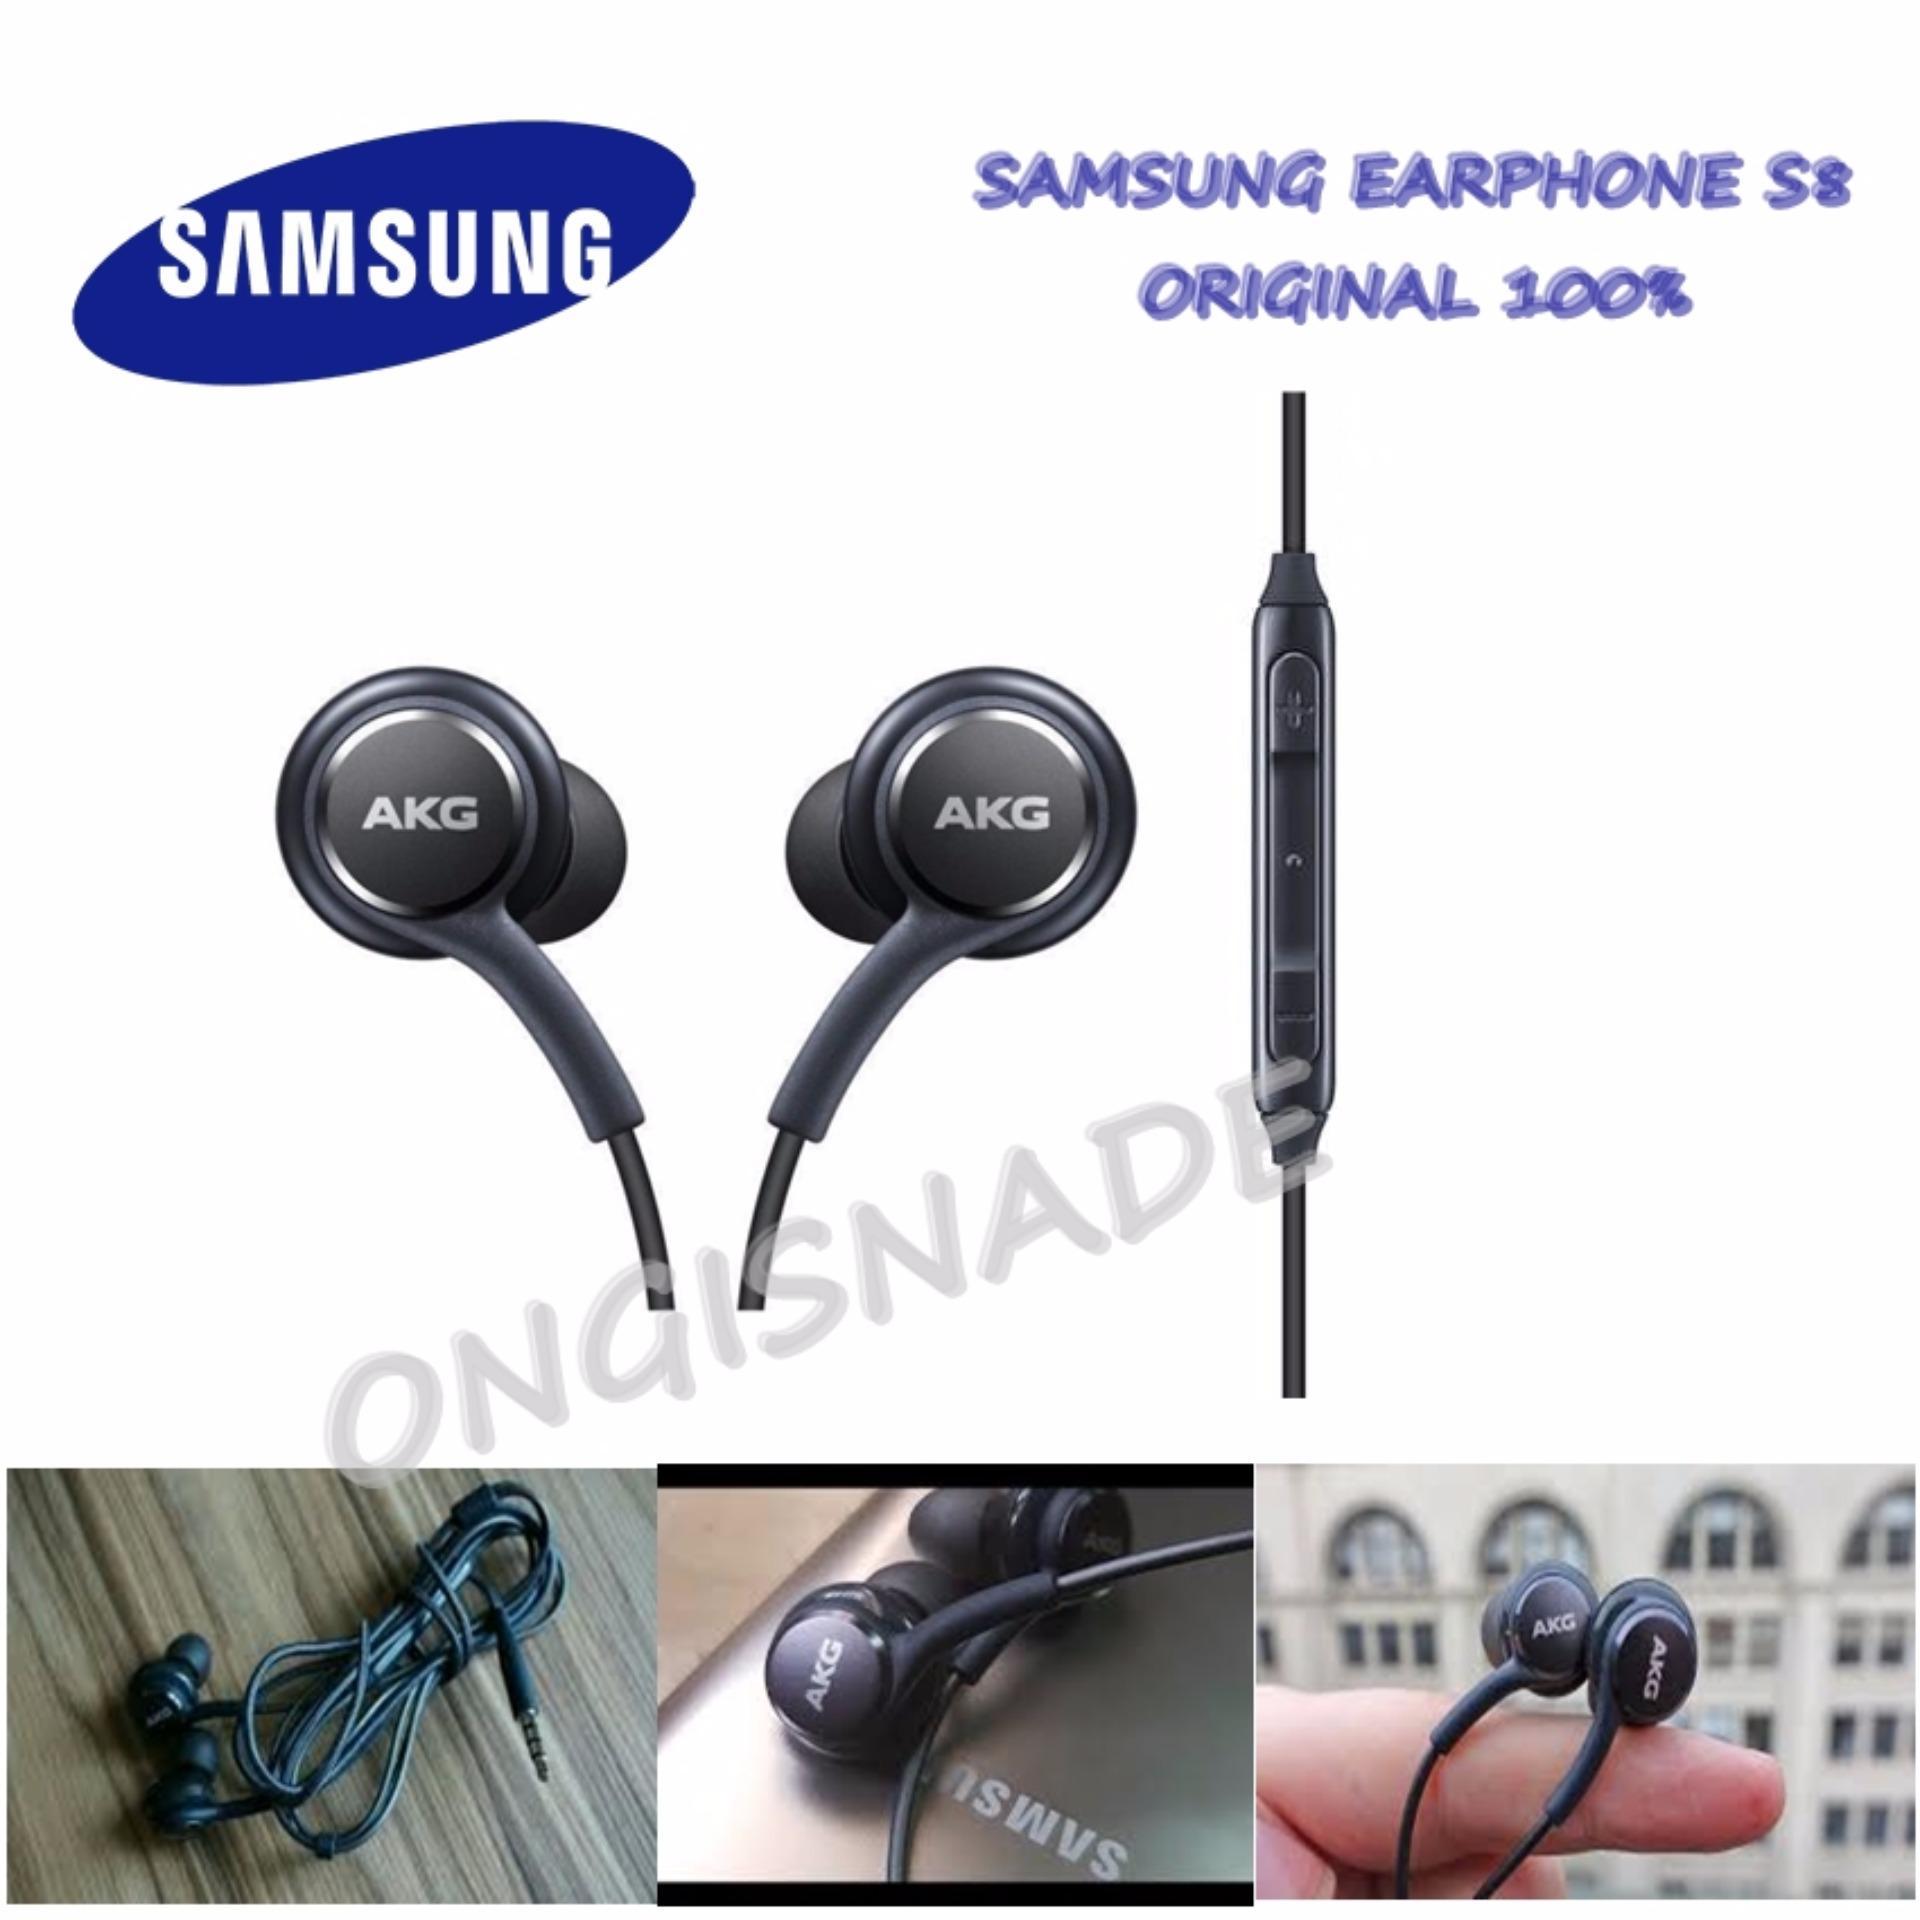 ... Bluetooth 4.1 Sport S6 Handsfree Earphone Headphones - Hitam. Source · Samsung Earphone/Handsfree Audio Stereo for Samsung Galaxy S8 byAKG Original -